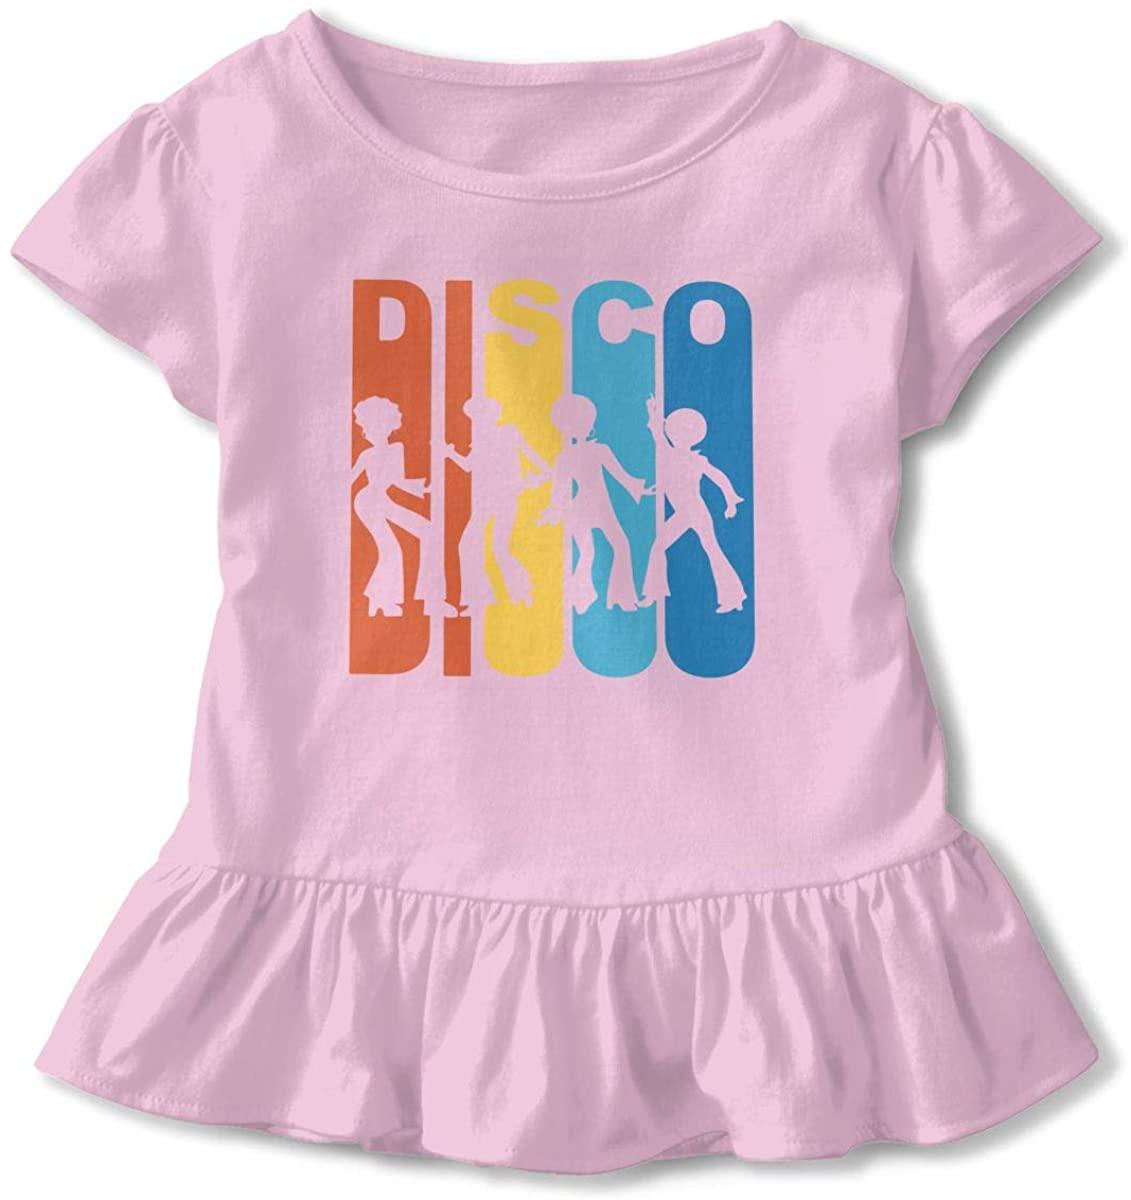 EASON-G Toddler Girls Ruffle T-Shirt Retro 1970s Disco Short Sleeve 2-6T